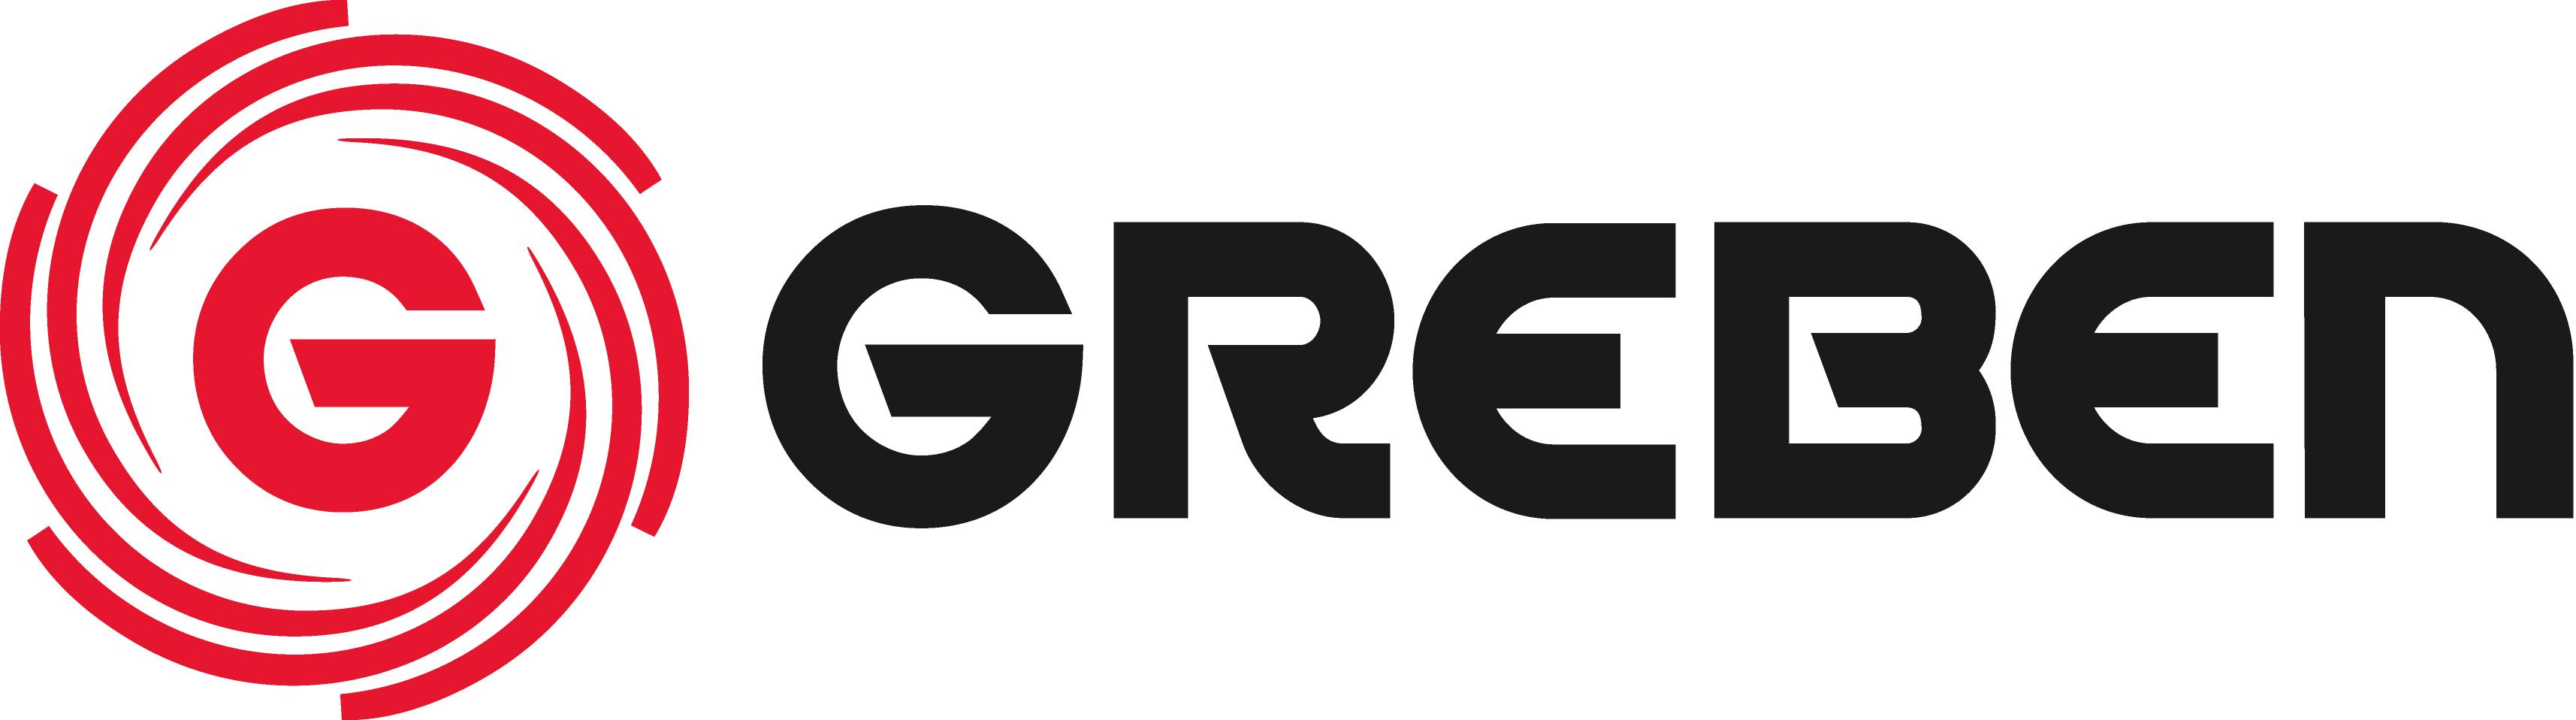 Greben polish producer of abrasive belts